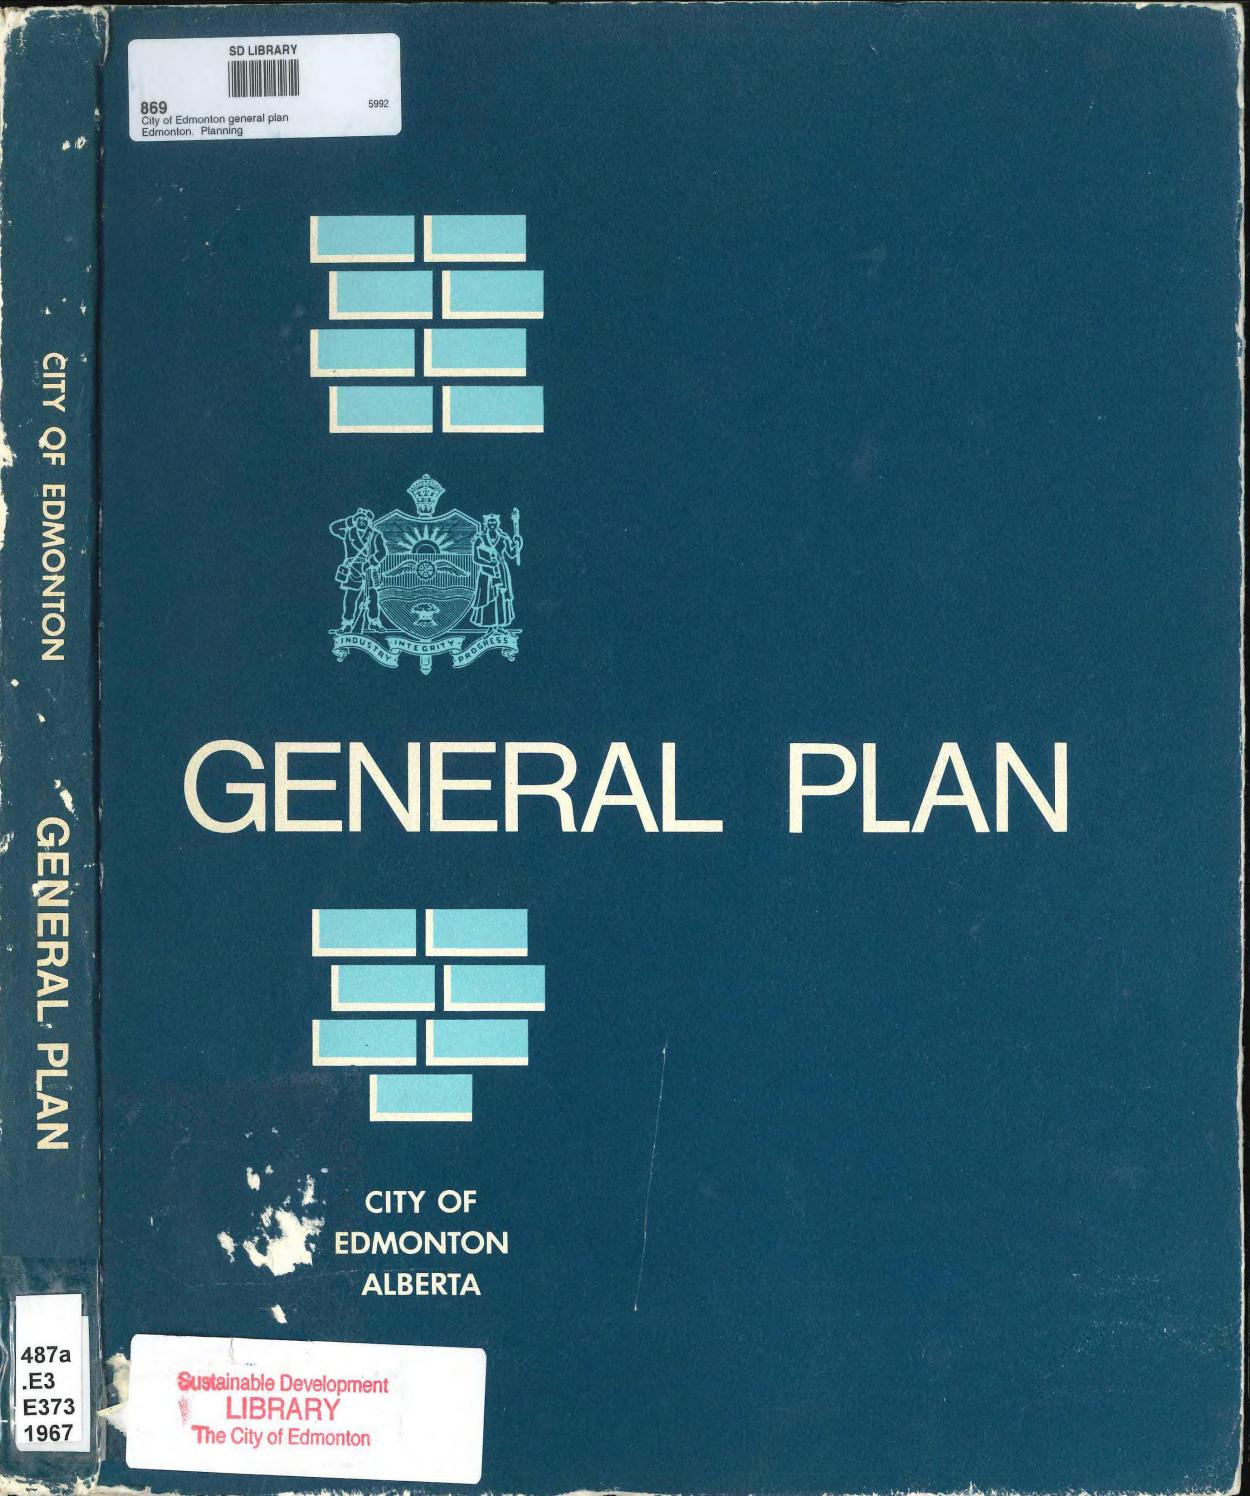 Edmonton (Alta ) - 1967 - City of Edmonton general plan